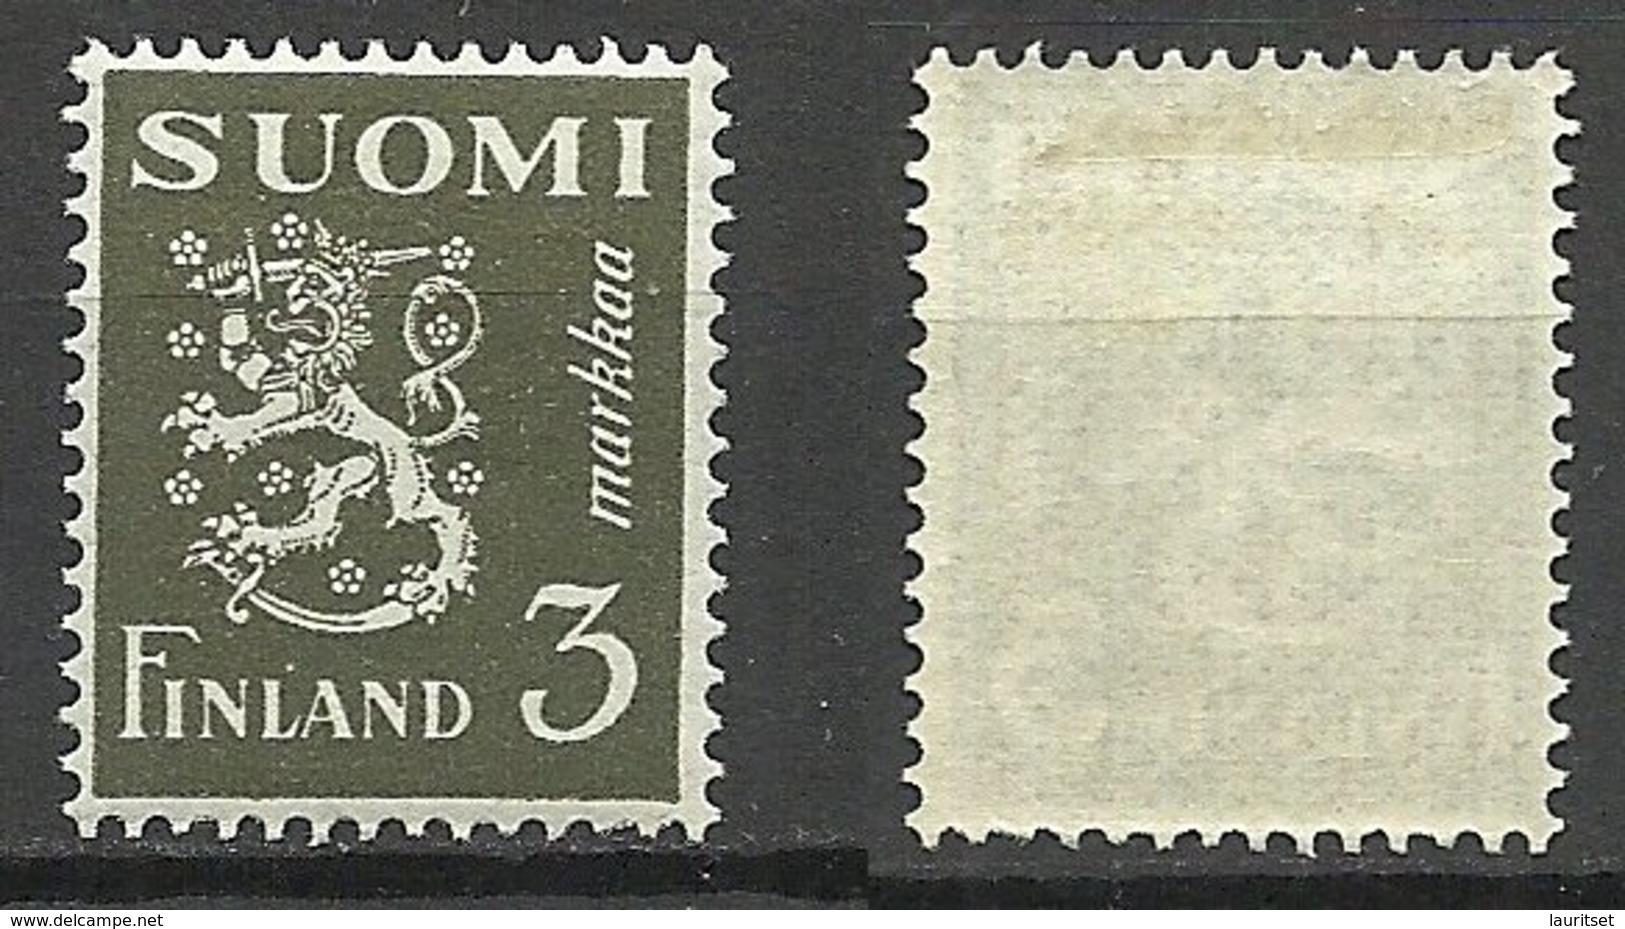 FINLAND Finnland SUOMI 1930 Michel 154 * - Neufs